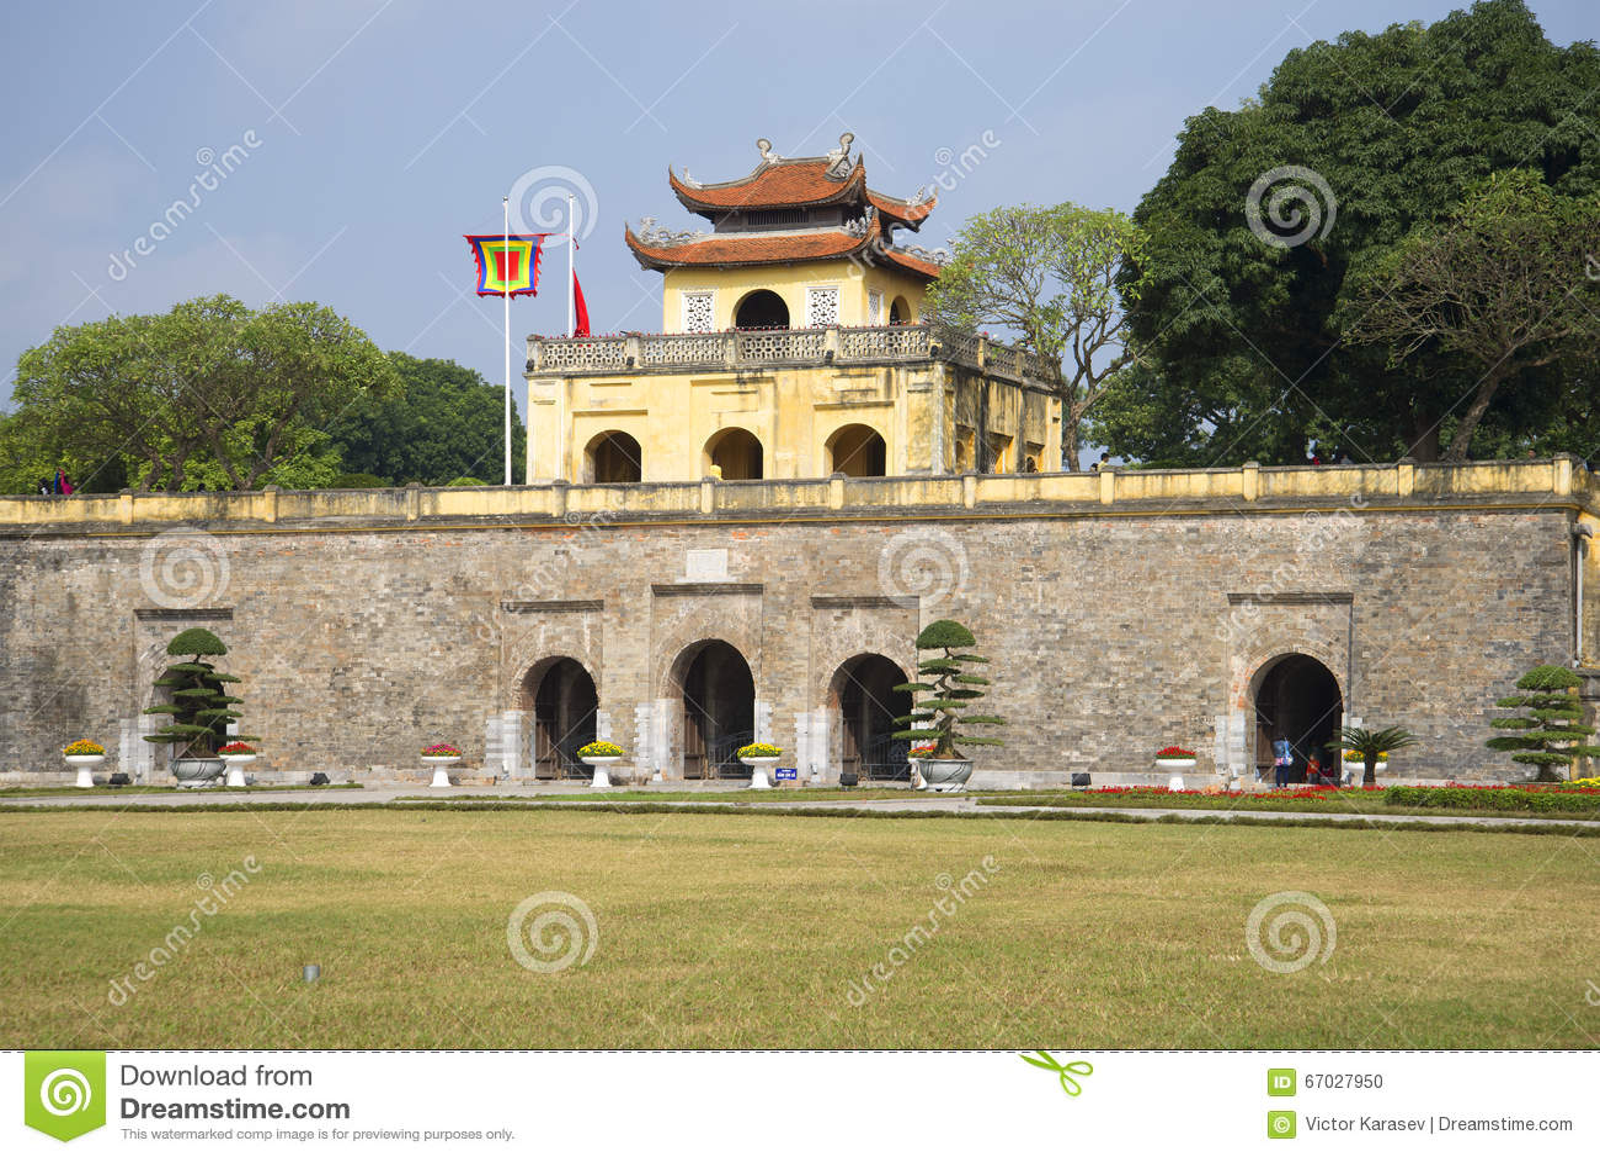 Бастион старой цитадели Ханоя Вьетнам